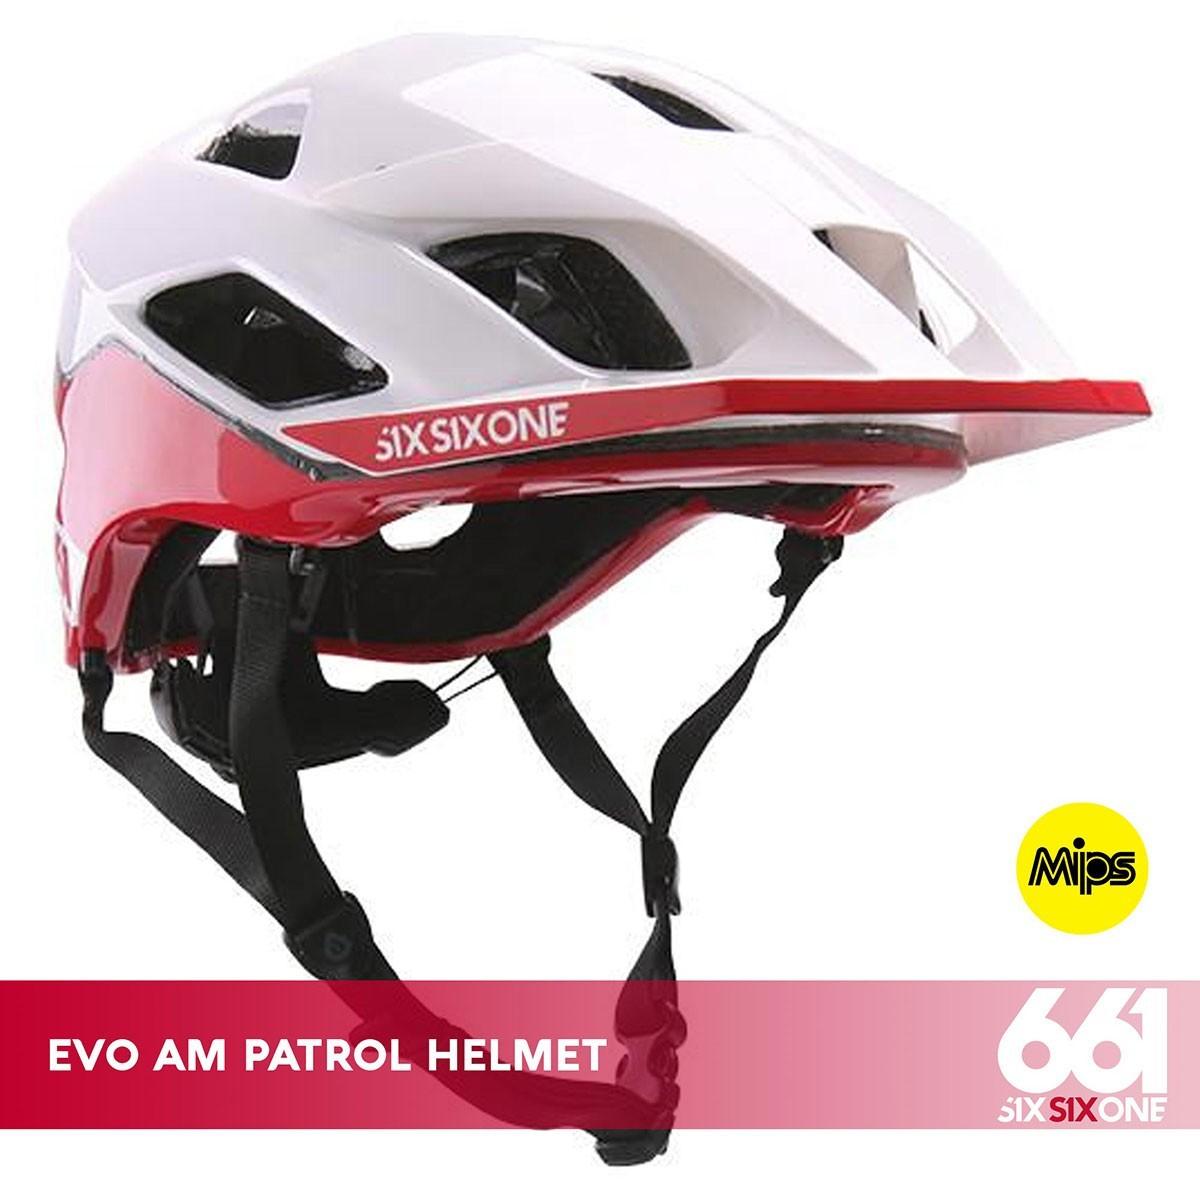 661 EVO AM PATROL MIPS CE WHITE RED - Изображение - AQUAMATRIX